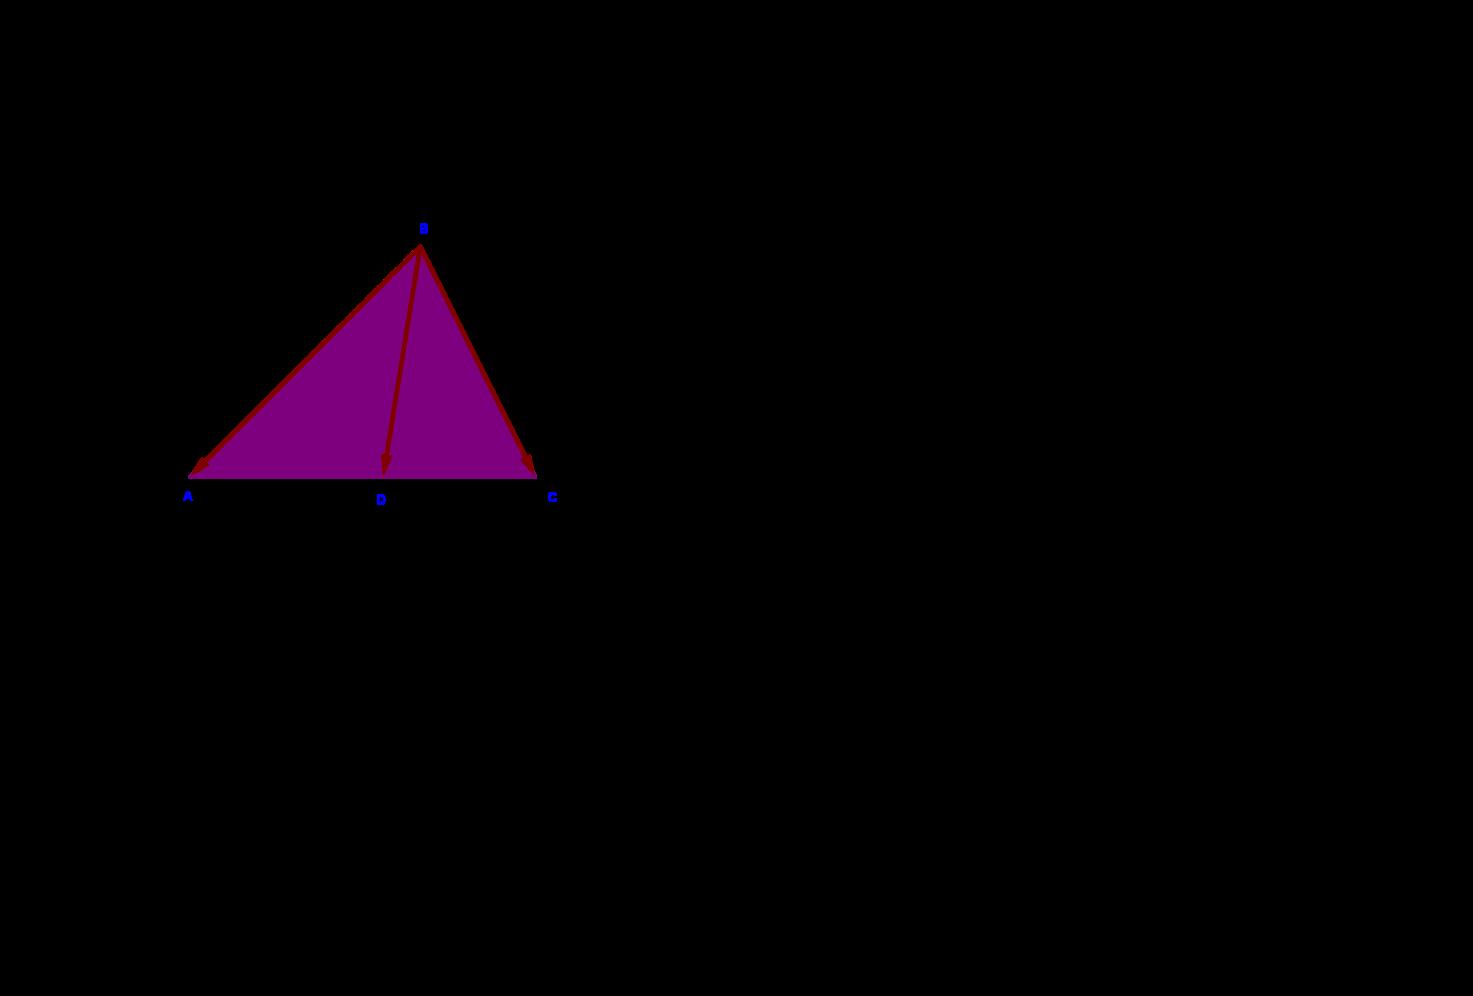 D:\Рабочий стол\векторный метод.png